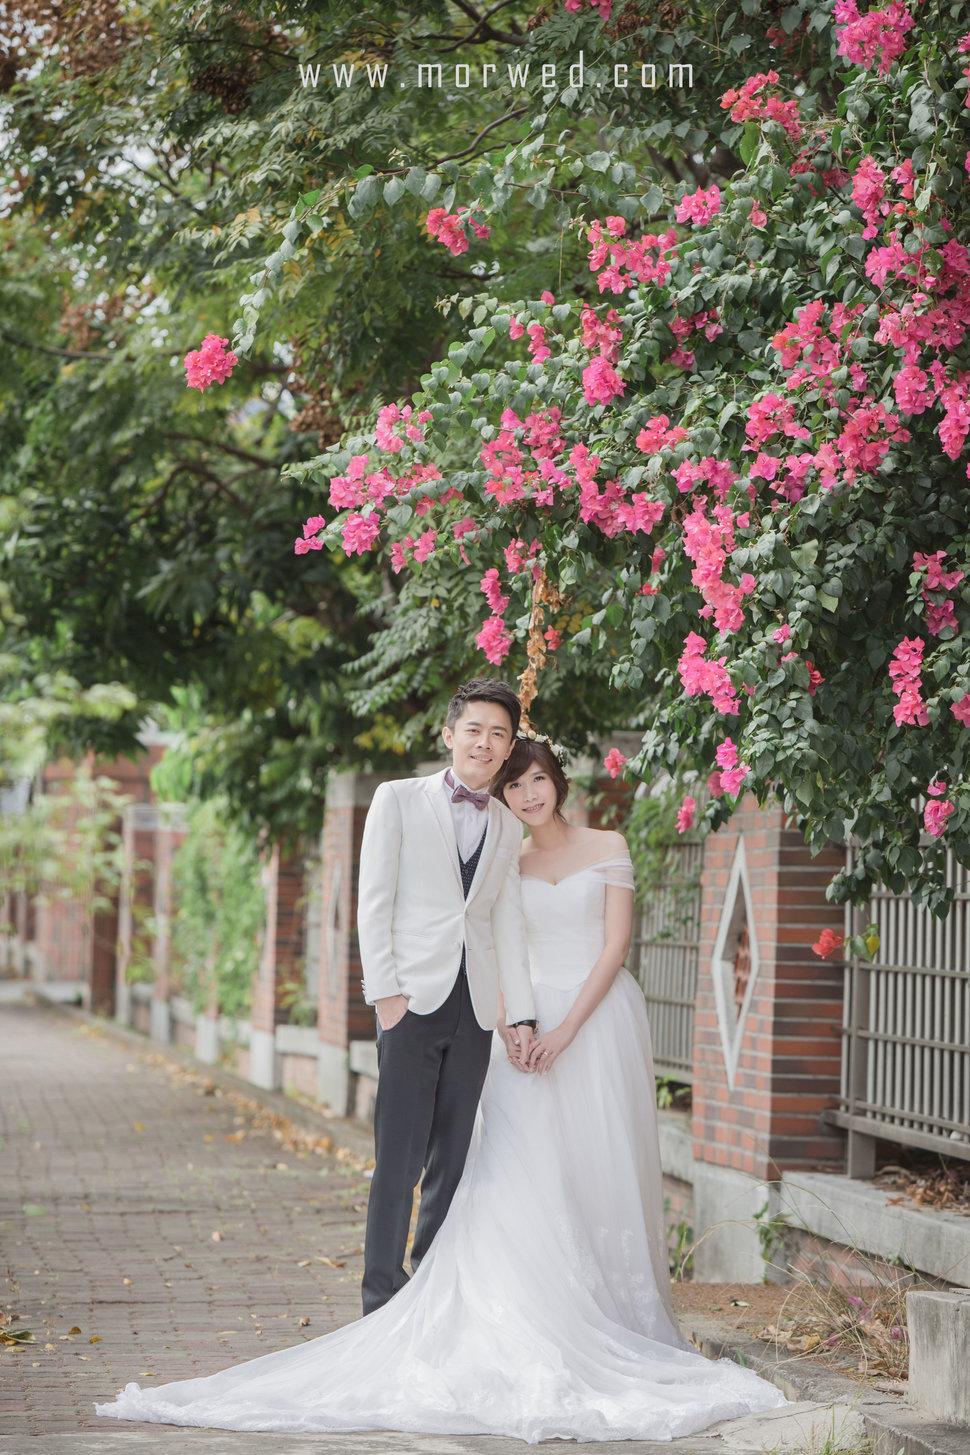 FEY_6734 - MOR 婚紗攝影工坊 - 結婚吧